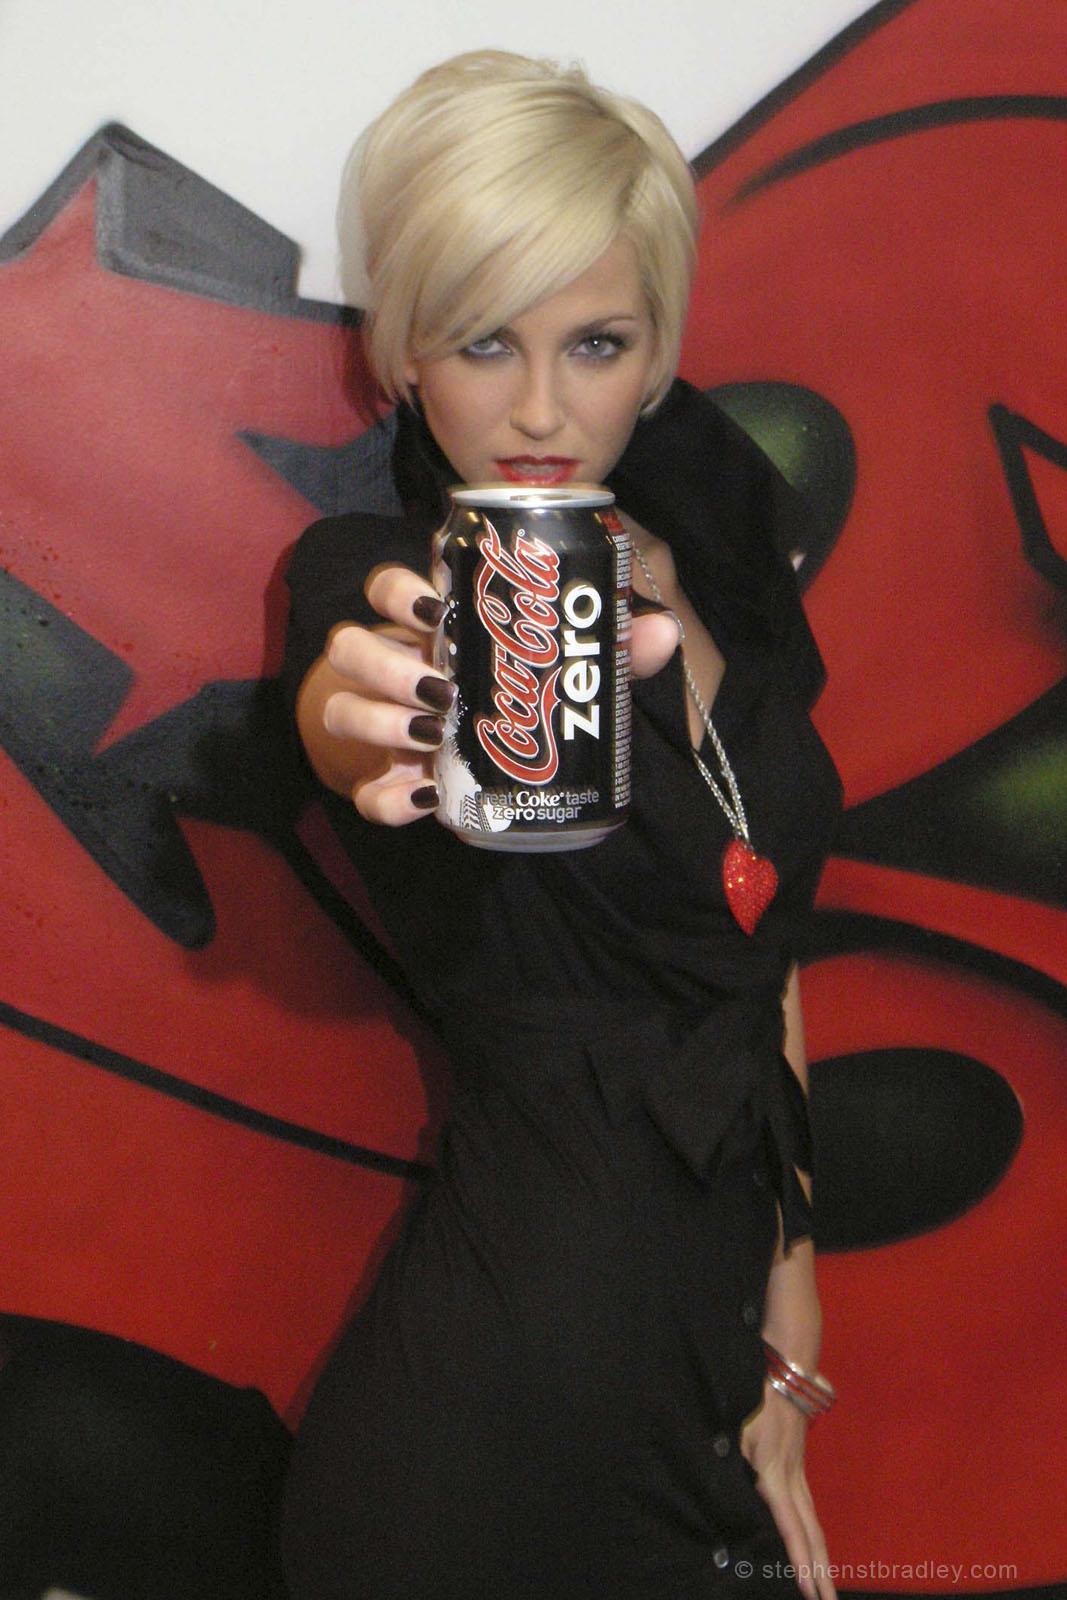 PR Photographer Dublin Ireland photo 1014105 - Sarah Harding Girls Aloud promoting Coca Cola Zero for Edelman PR